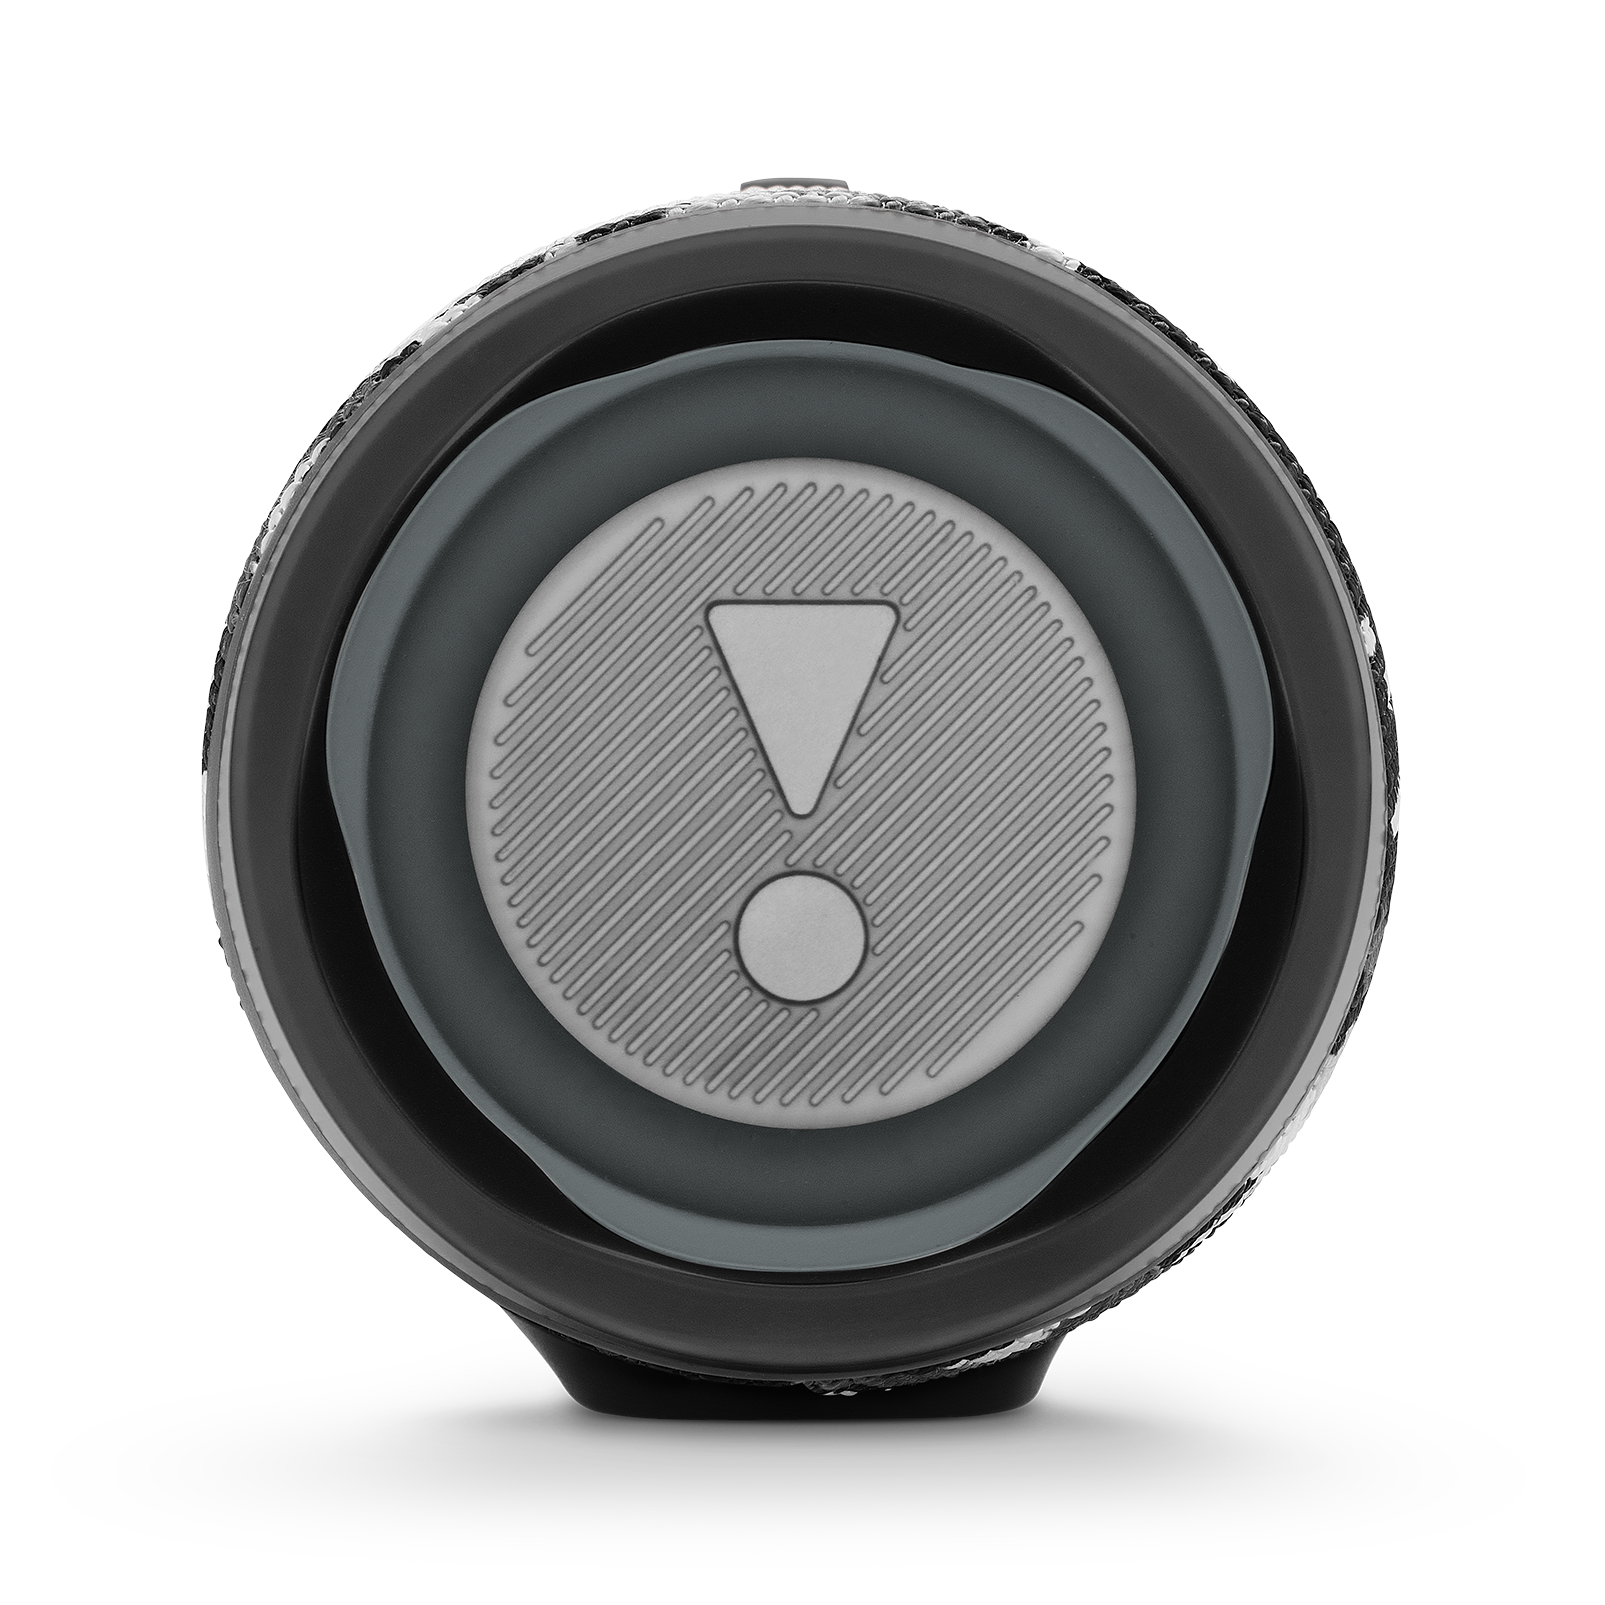 JBL Charge 4 - Black/White Camouflage - Portable Bluetooth speaker - Detailshot 3